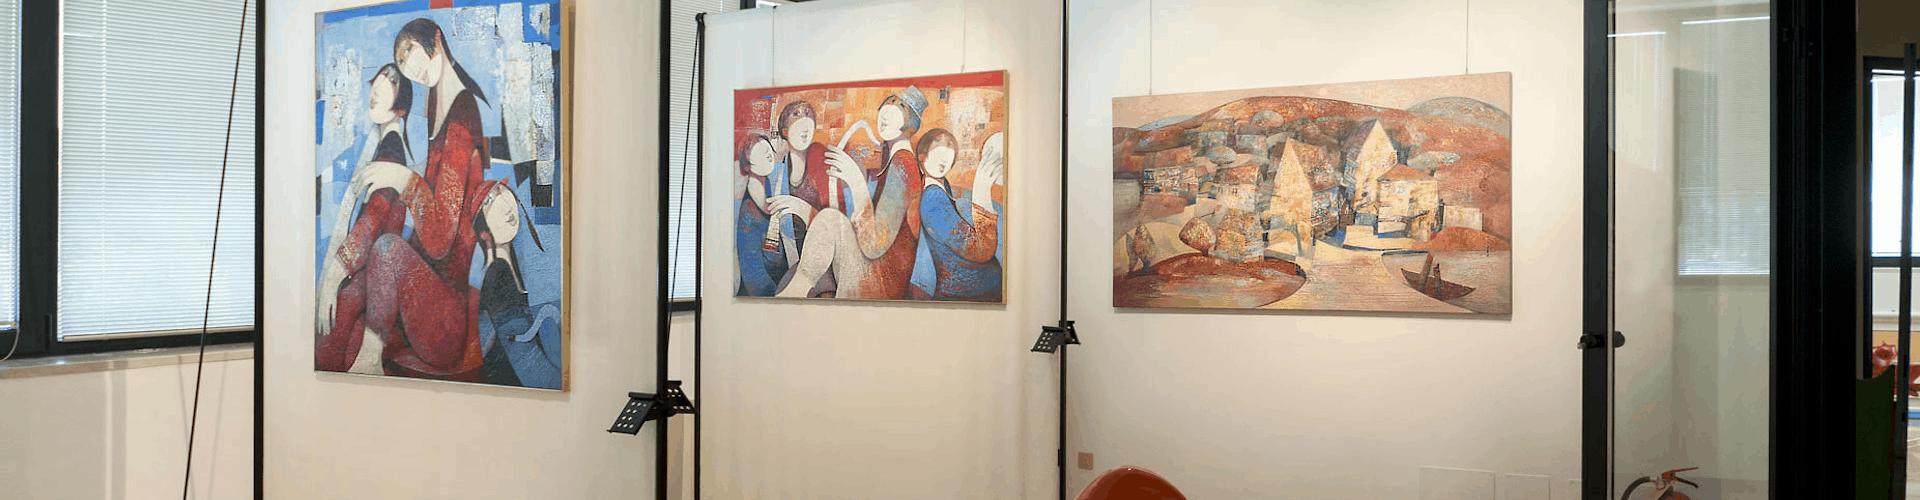 Galleria d'Arte - D'Amico Arreda